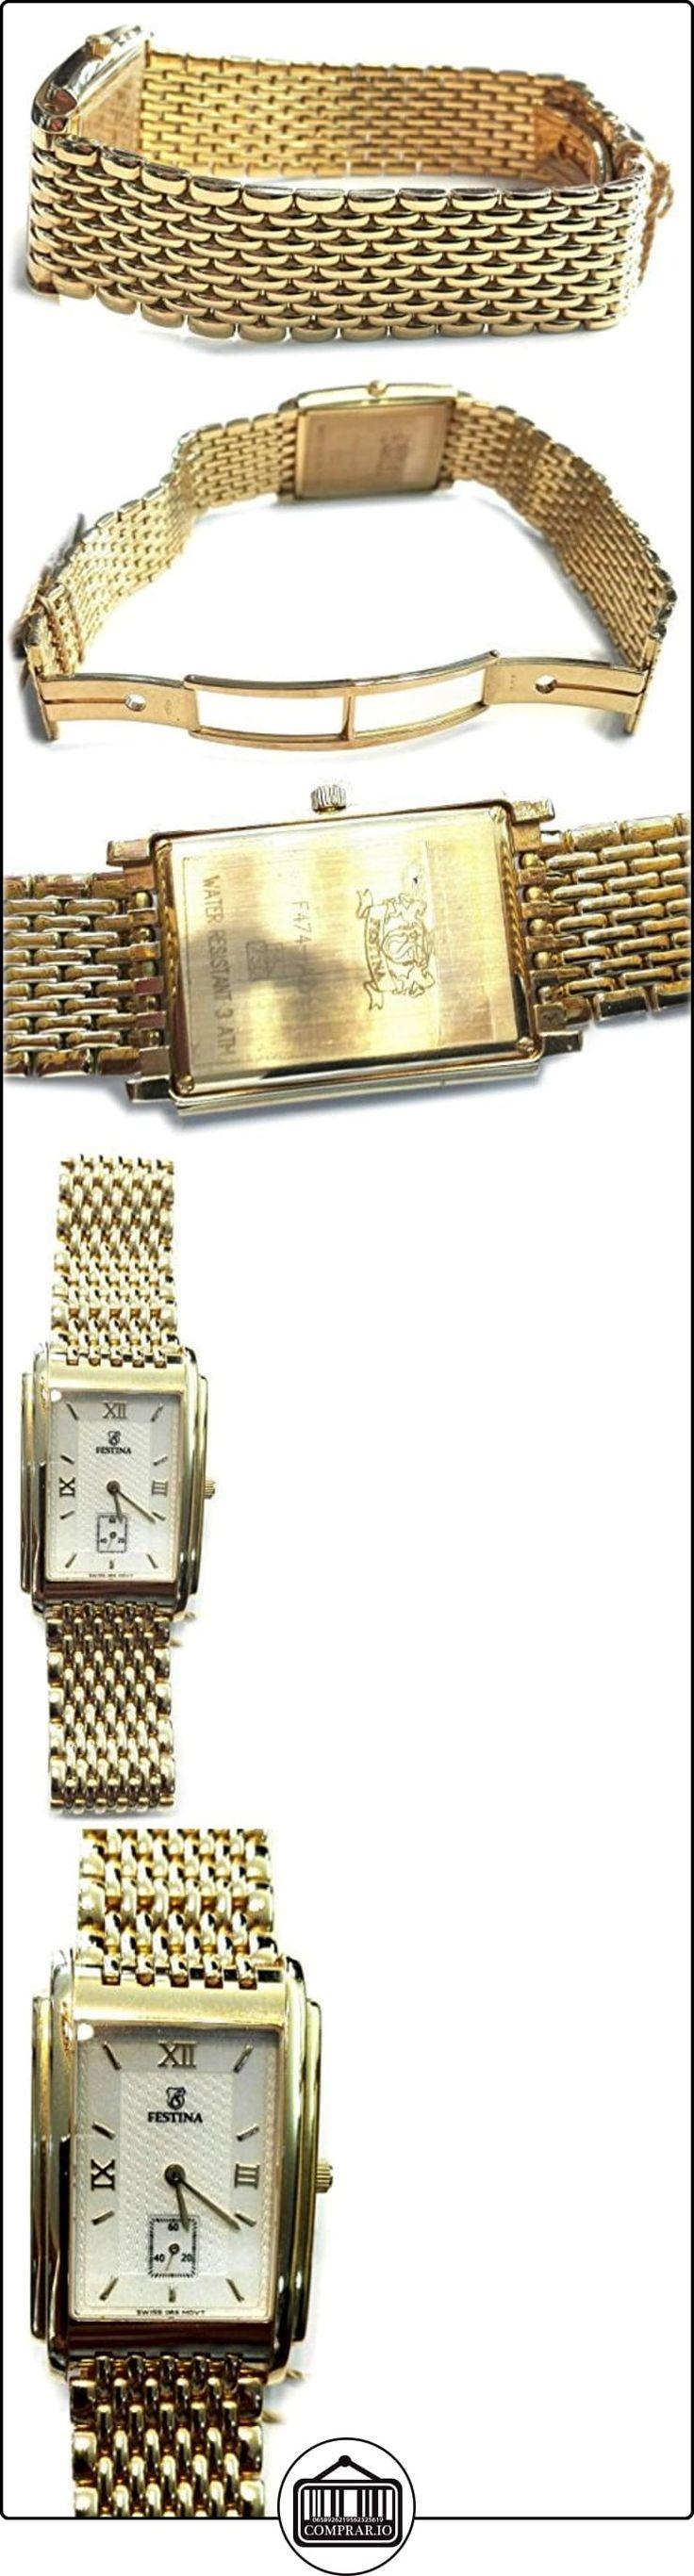 Festina Oro F0474/1 - Reloj Oro 18 Quilates De Caballero Modelo Rectangular  ✿ Relojes para hombre - (Lujo) ✿